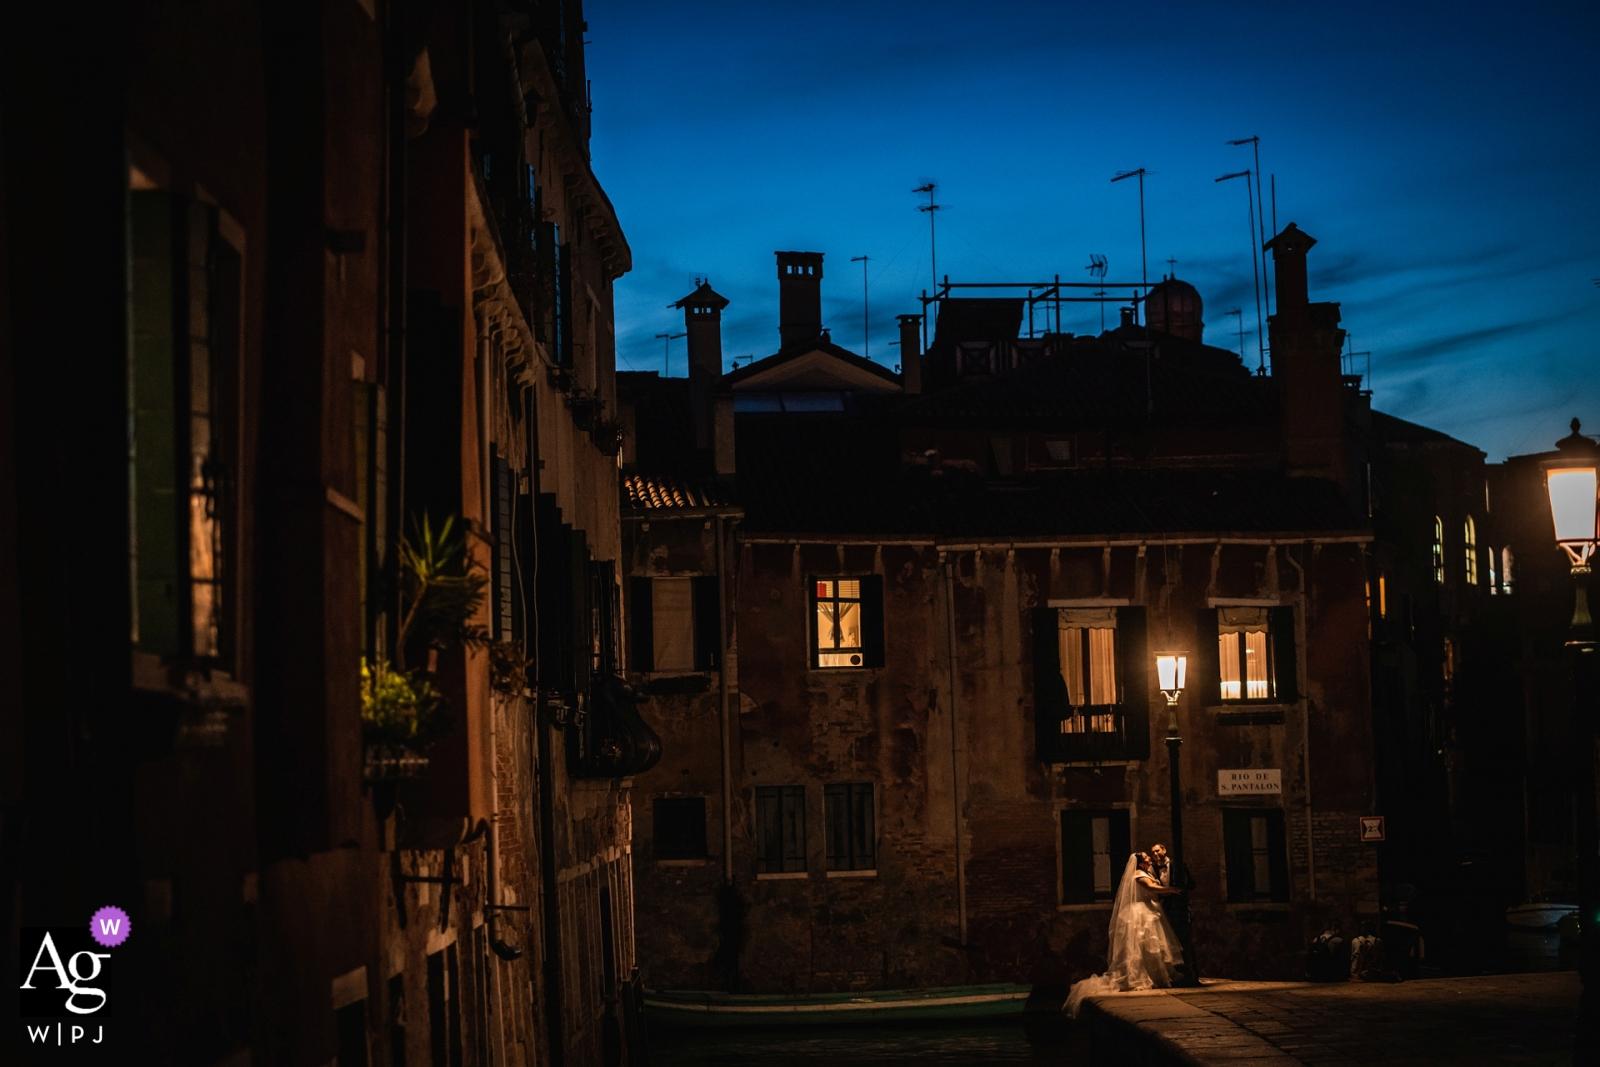 Venice, Italy wedding portrait of the couple | Venice at night